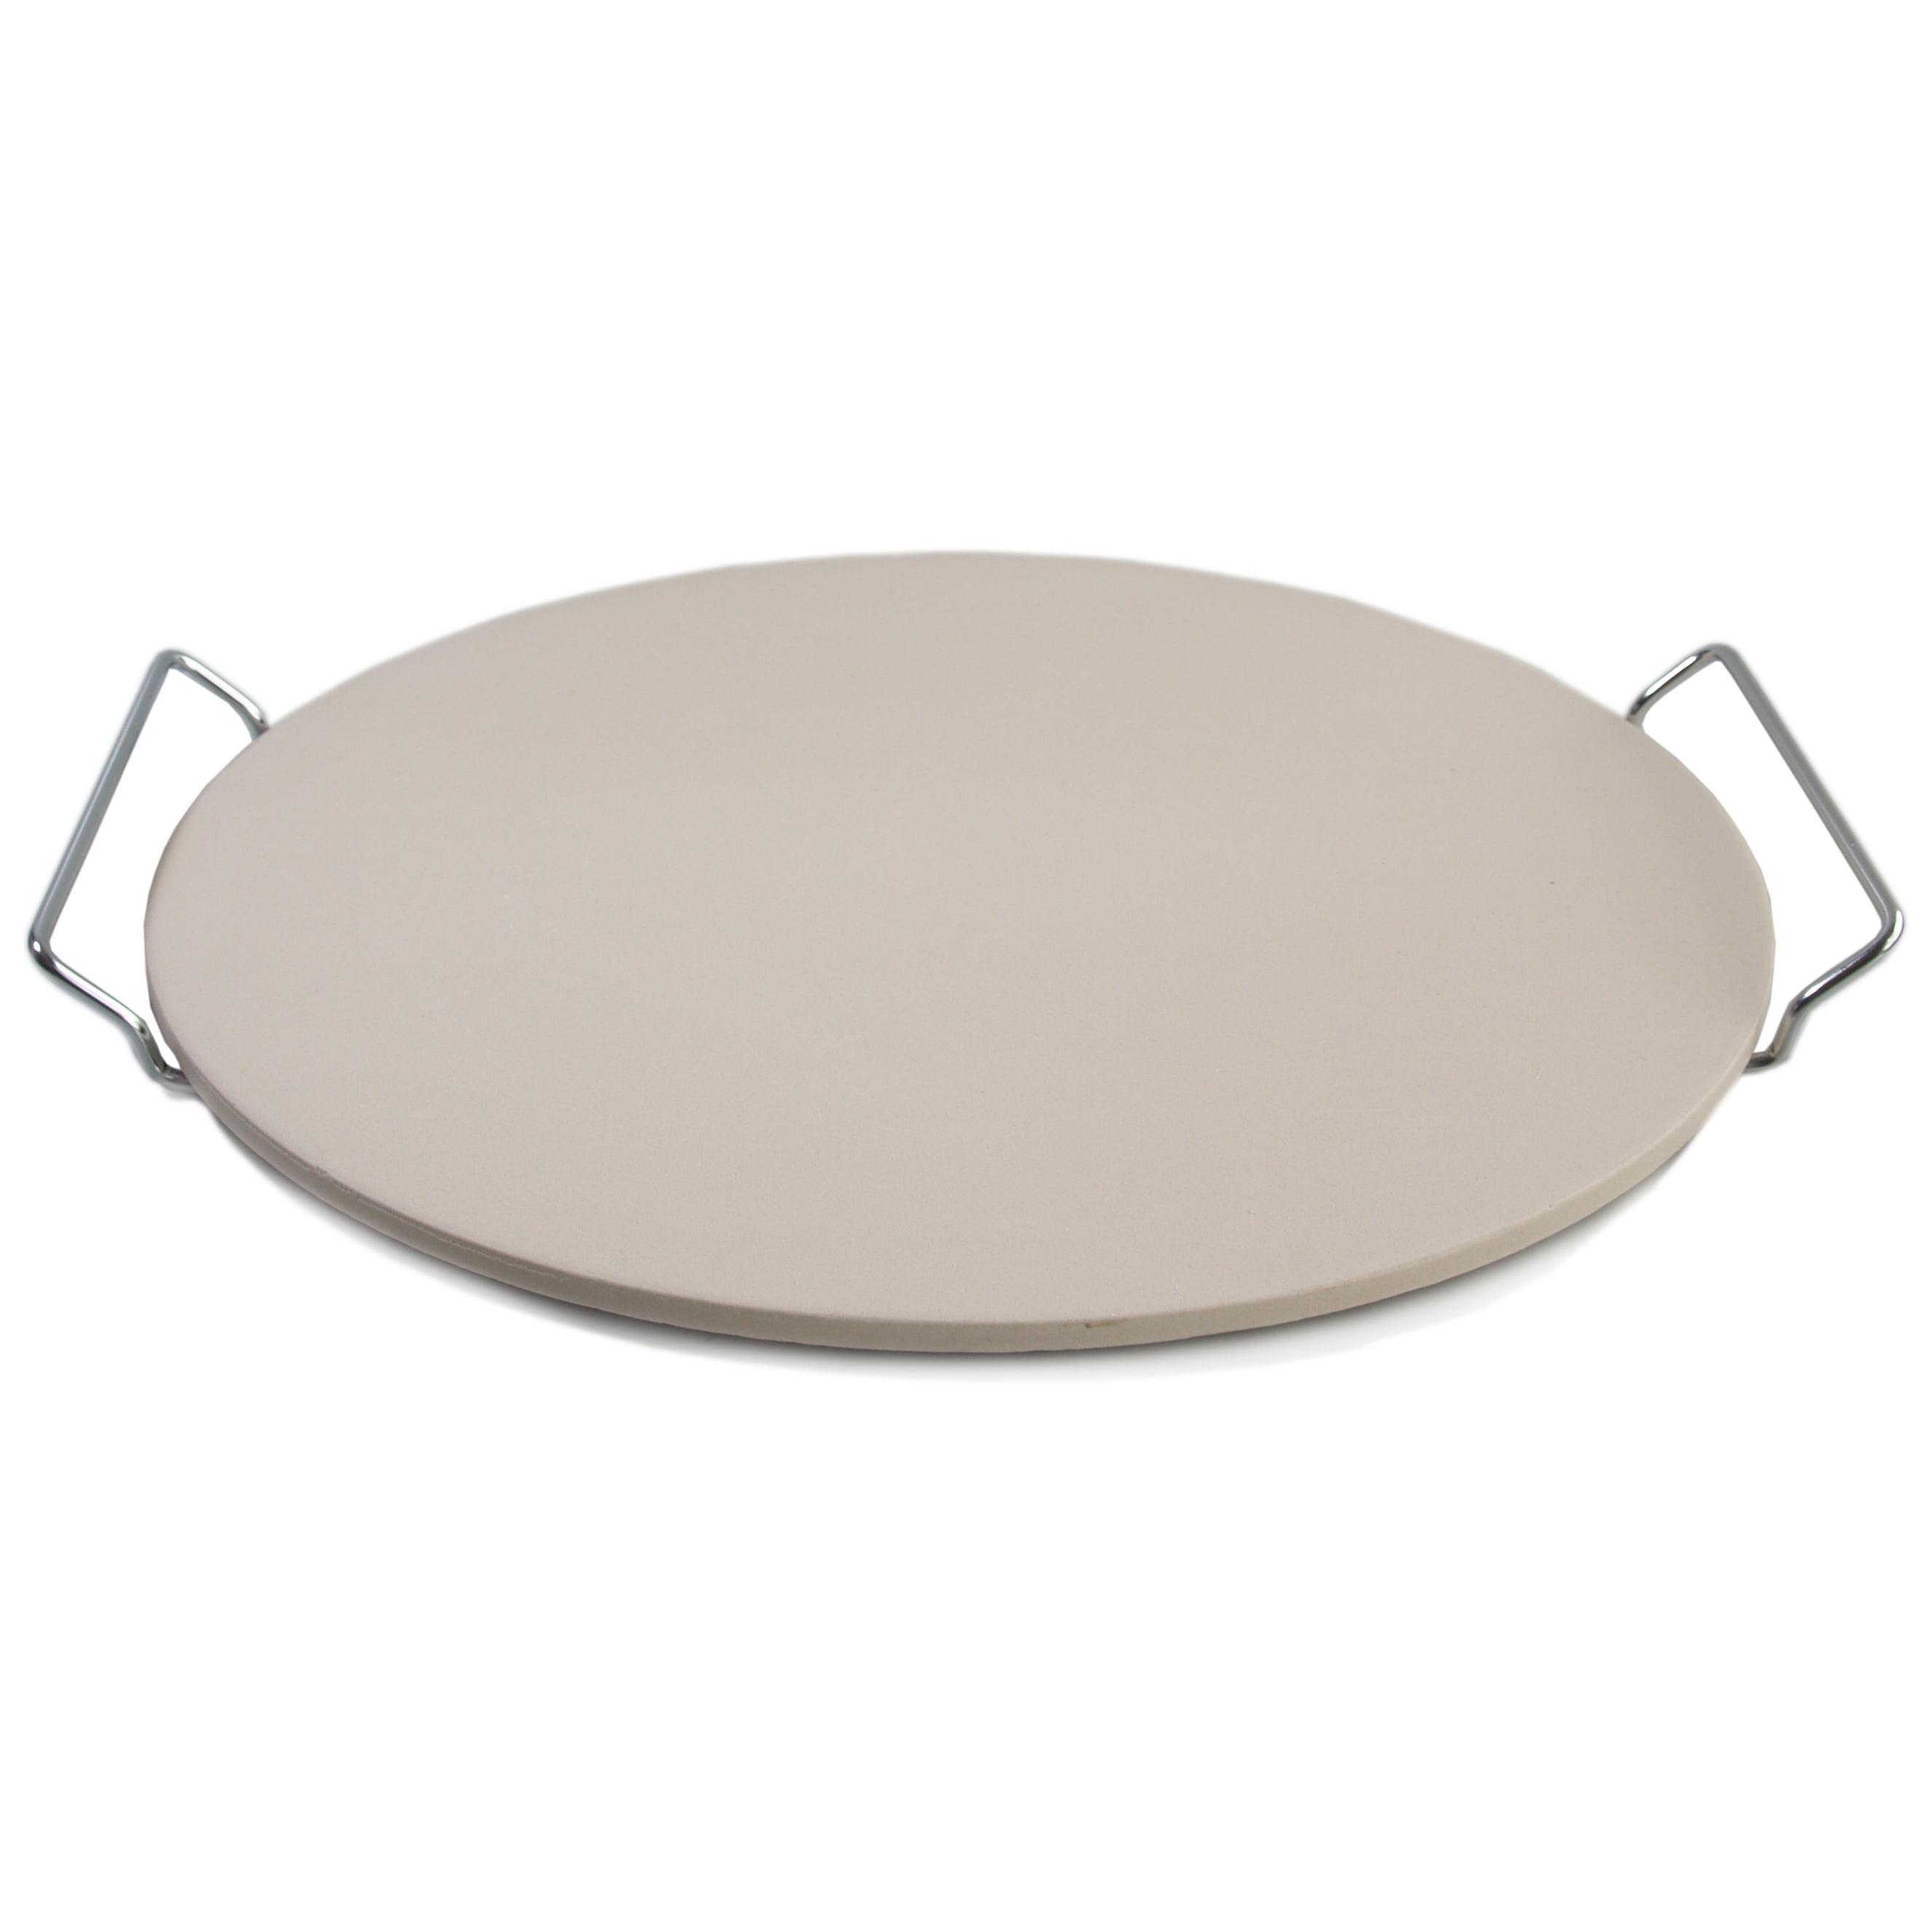 Bialetti Taste of Italy Ceramic Round Pizza Stone, 14.75 Inch by Bialetti